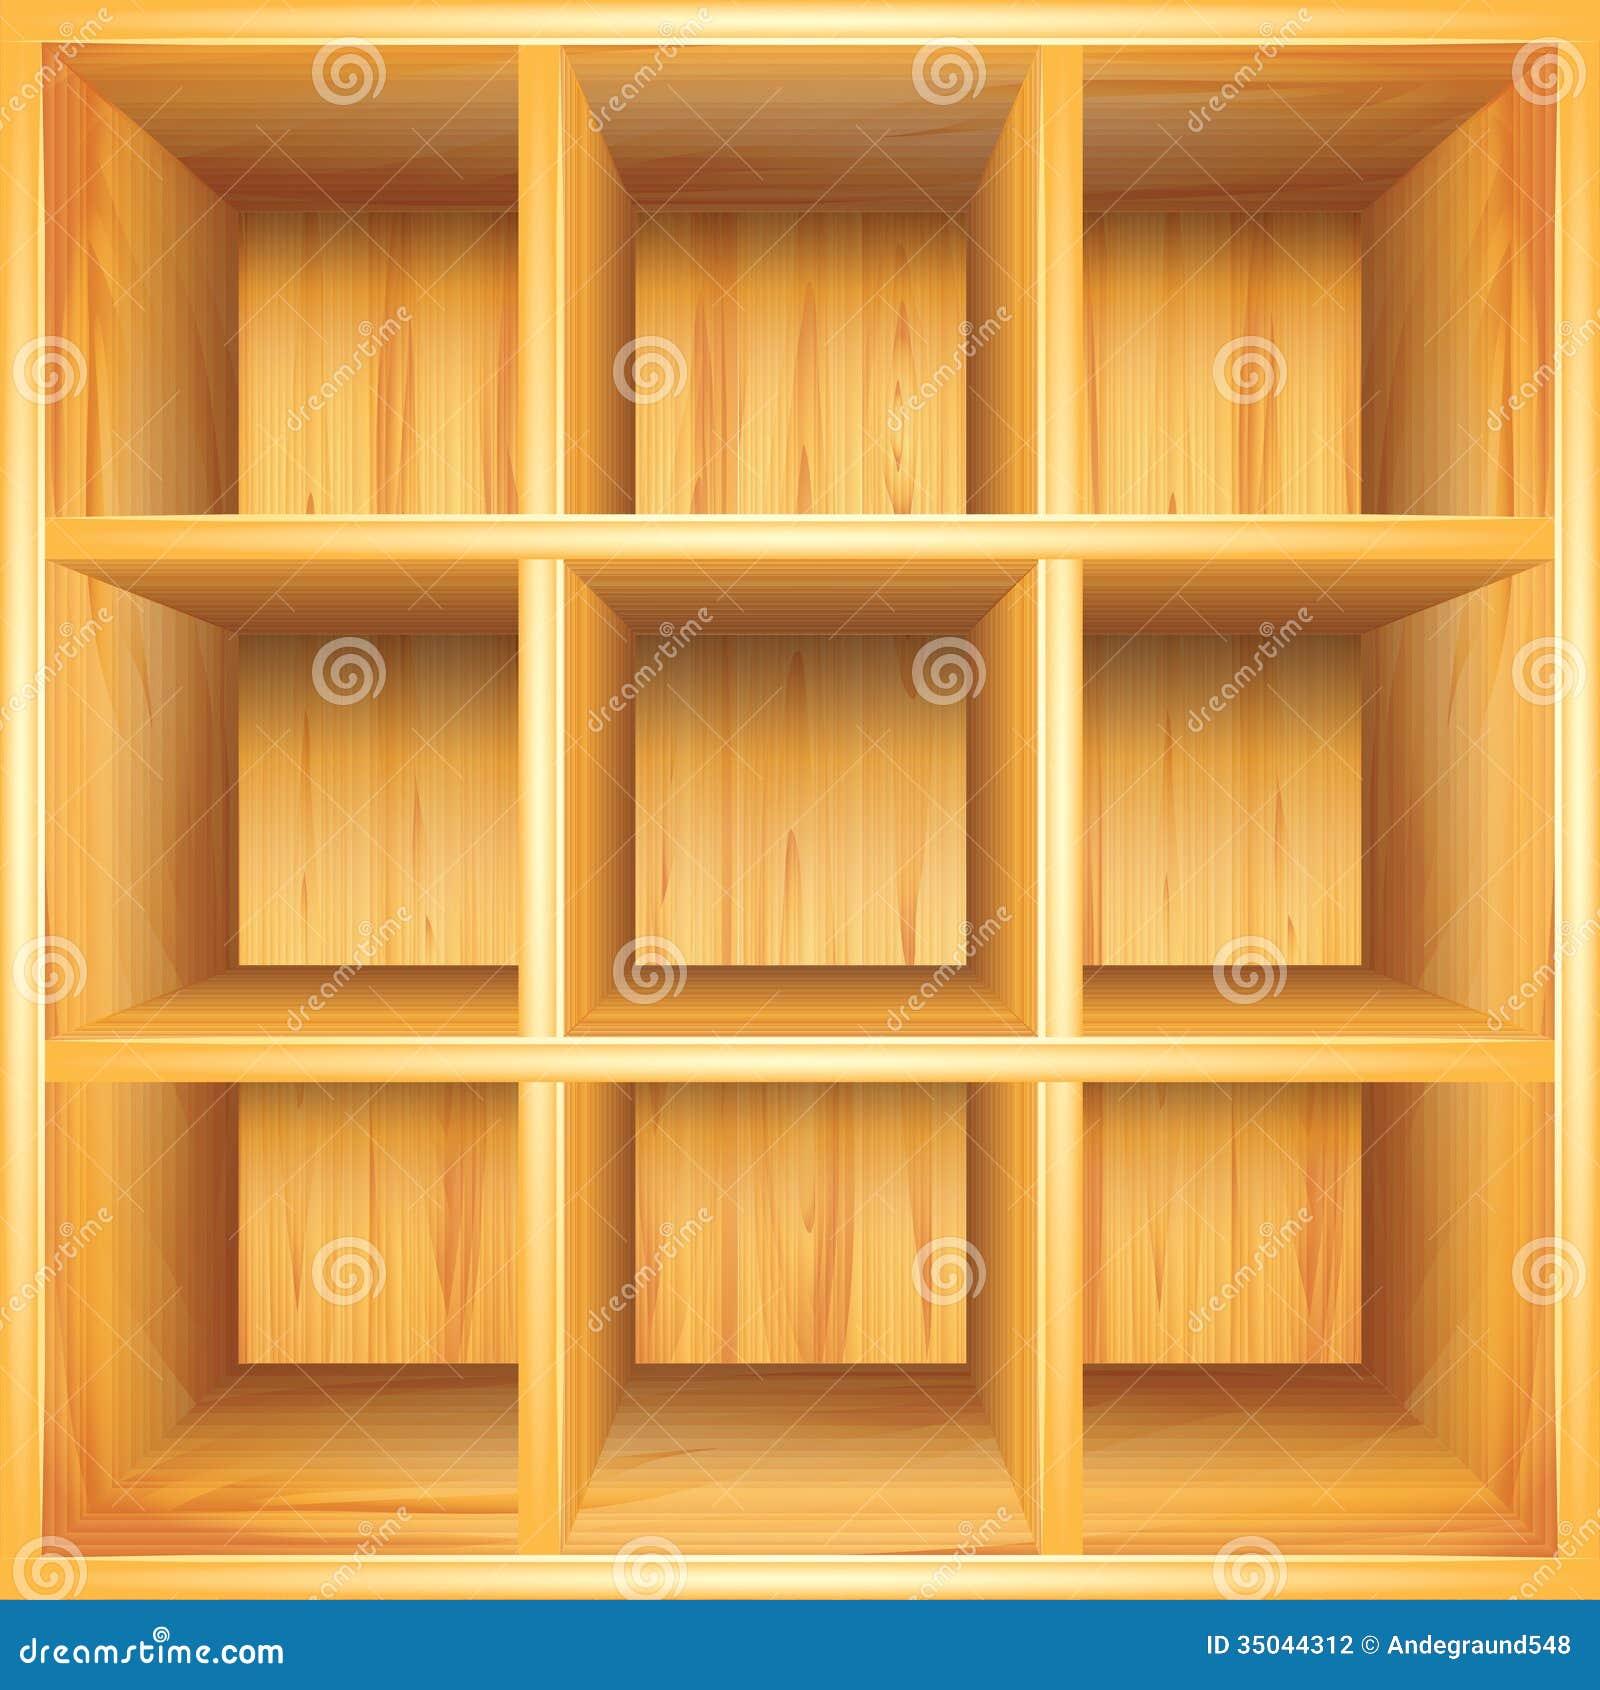 Wooden Bookshelf, Vector Background Stock Photography ...